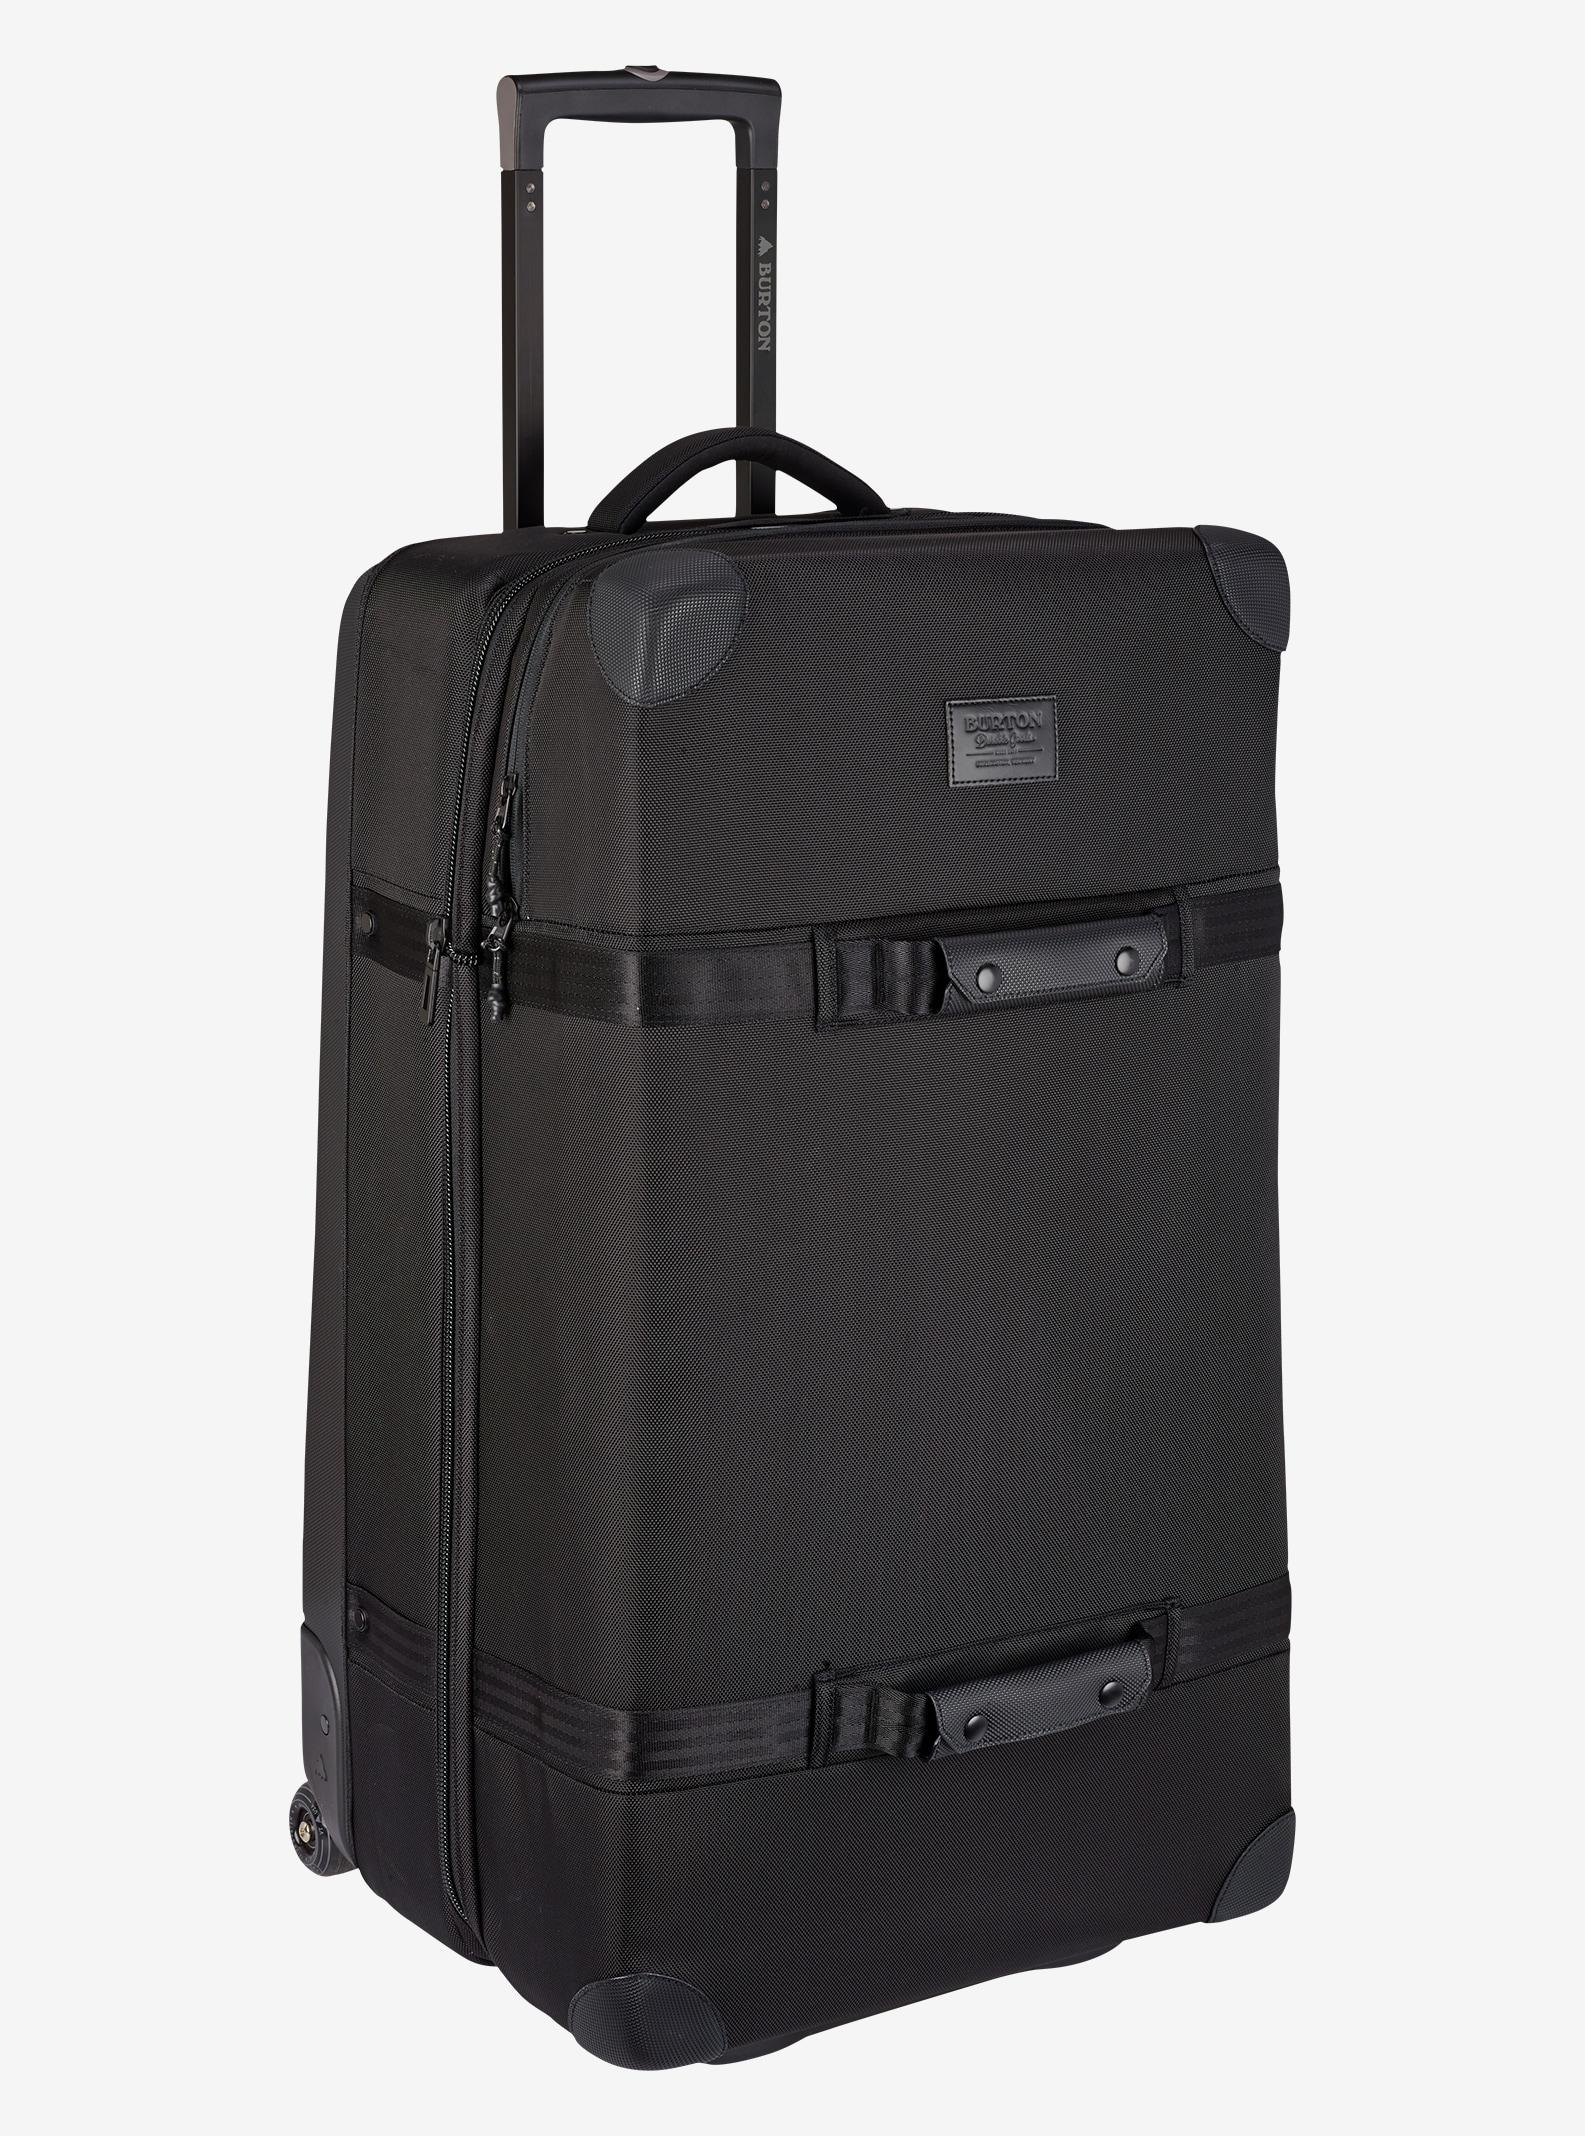 Burton Wheelie Sub Travel Bag shown in True Black Ballistic